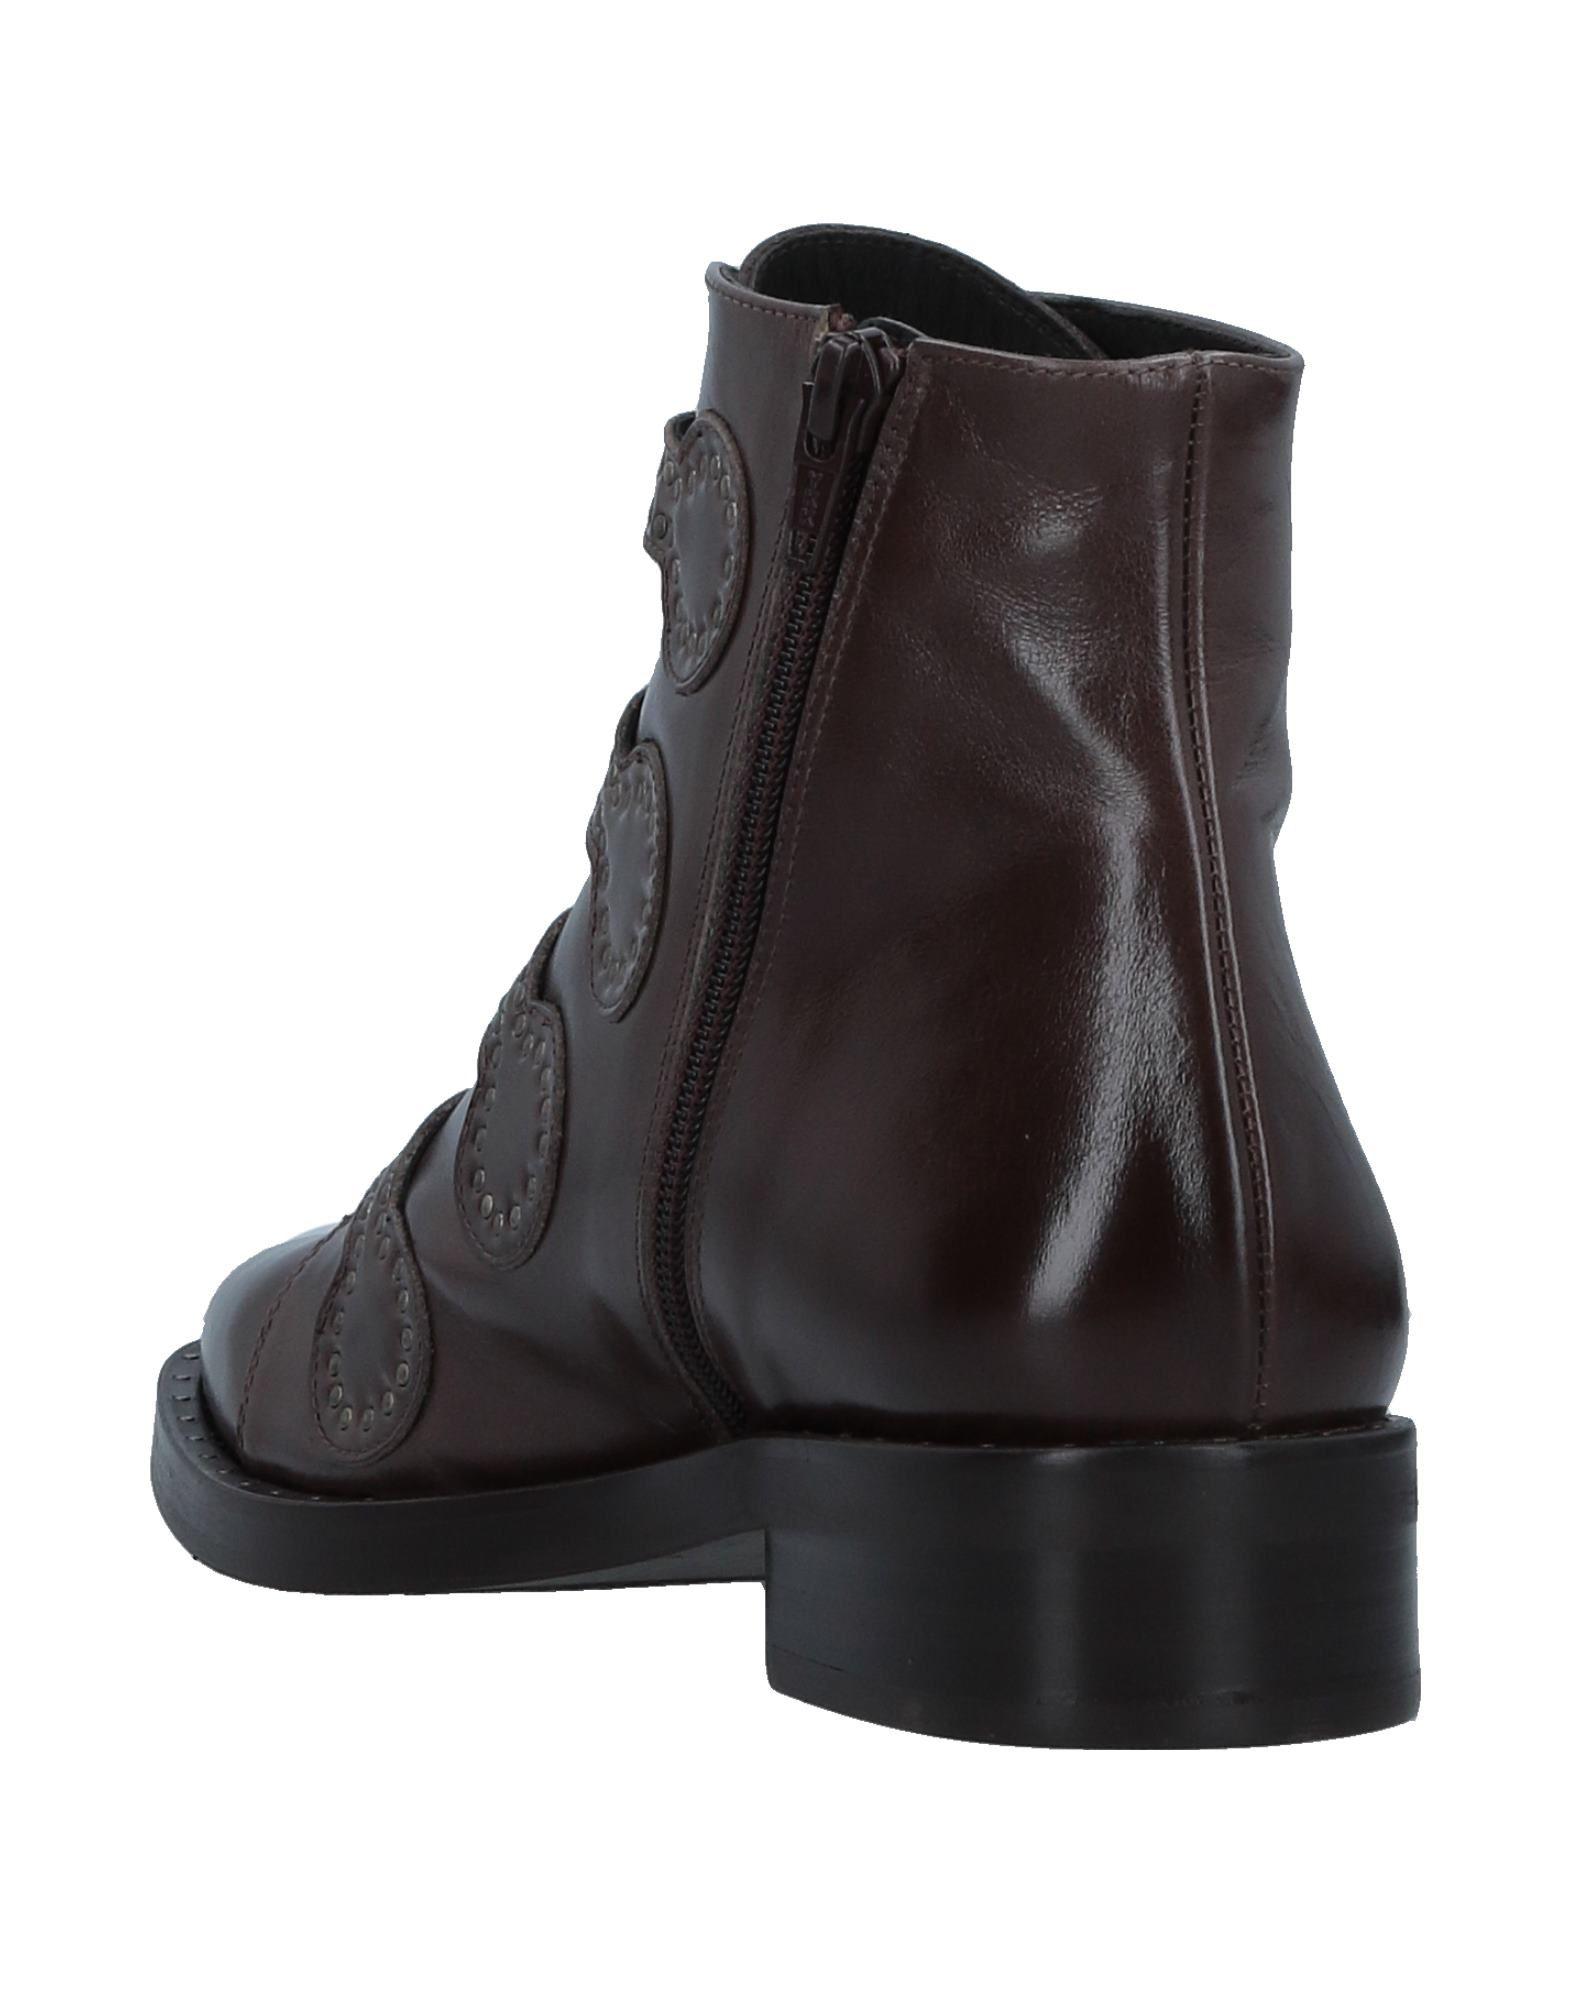 Stilvolle billige Schuhe Zinda Stiefelette Damen  11517923PI 11517923PI 11517923PI 222ff7